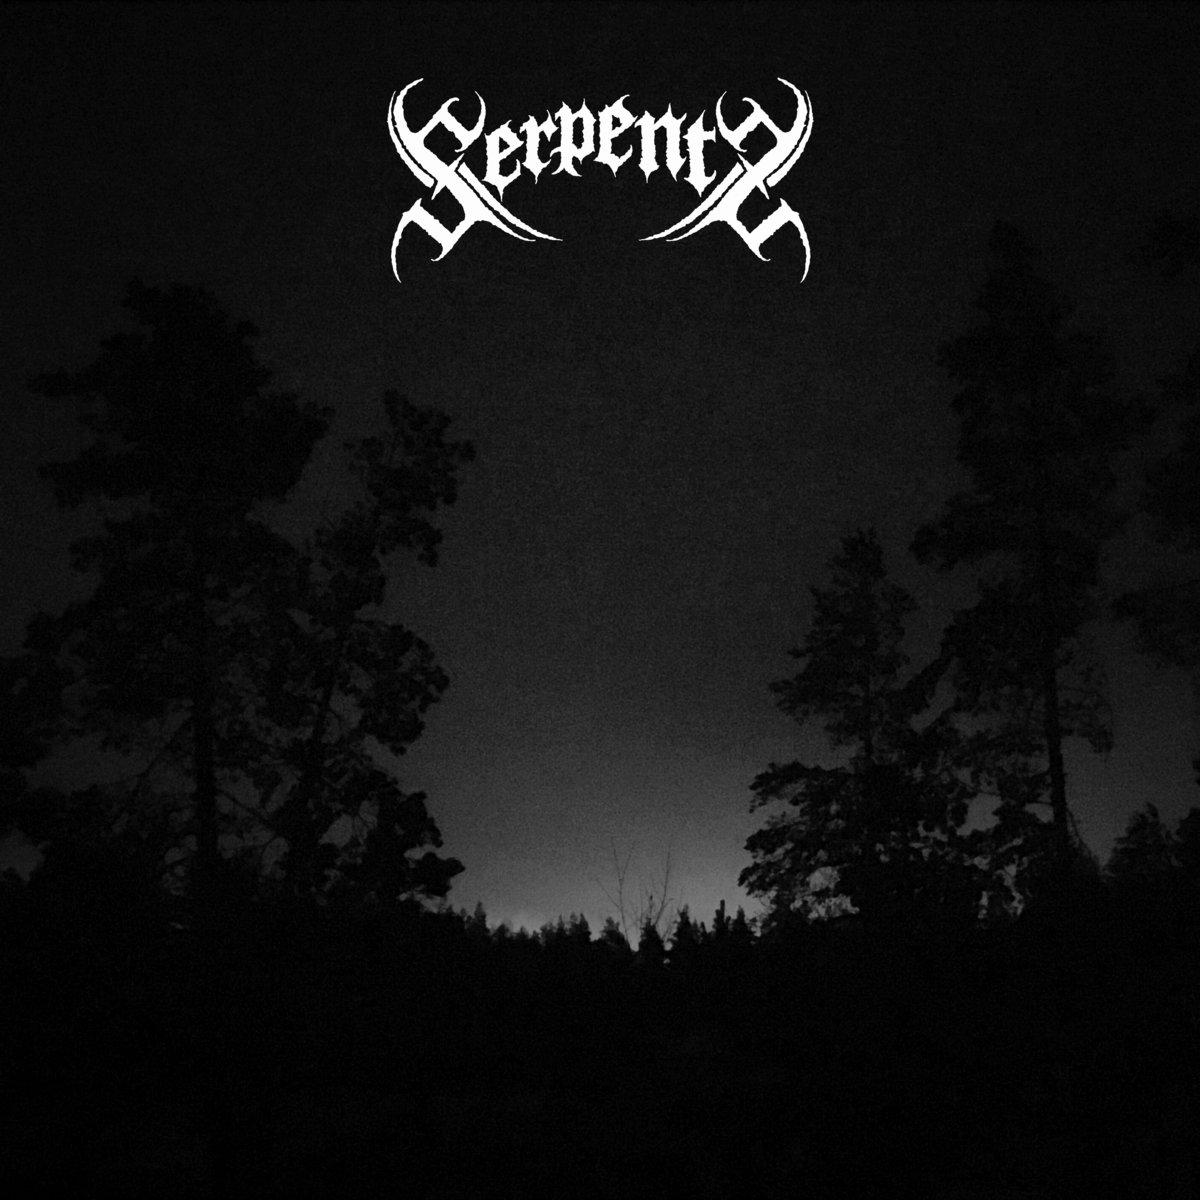 Serpents - swedish black savagery